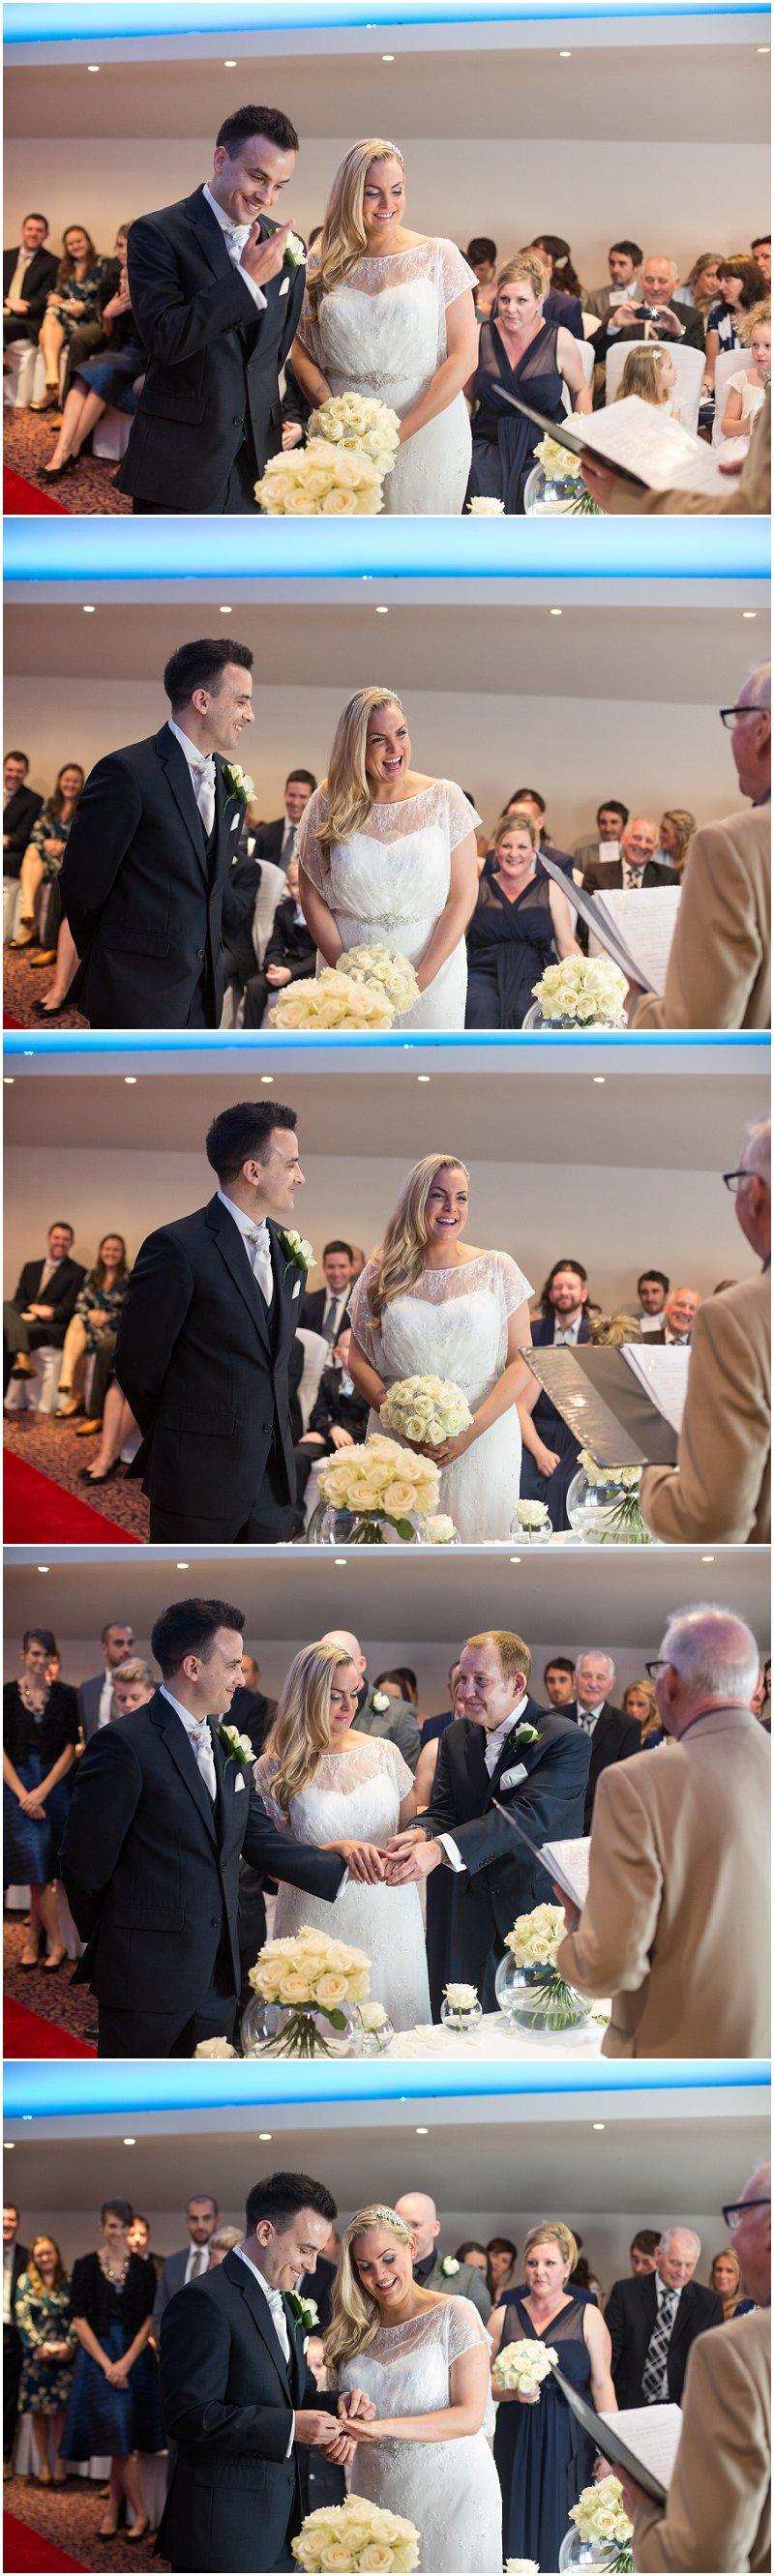 Wedding ceremony photography at Red Hall bury